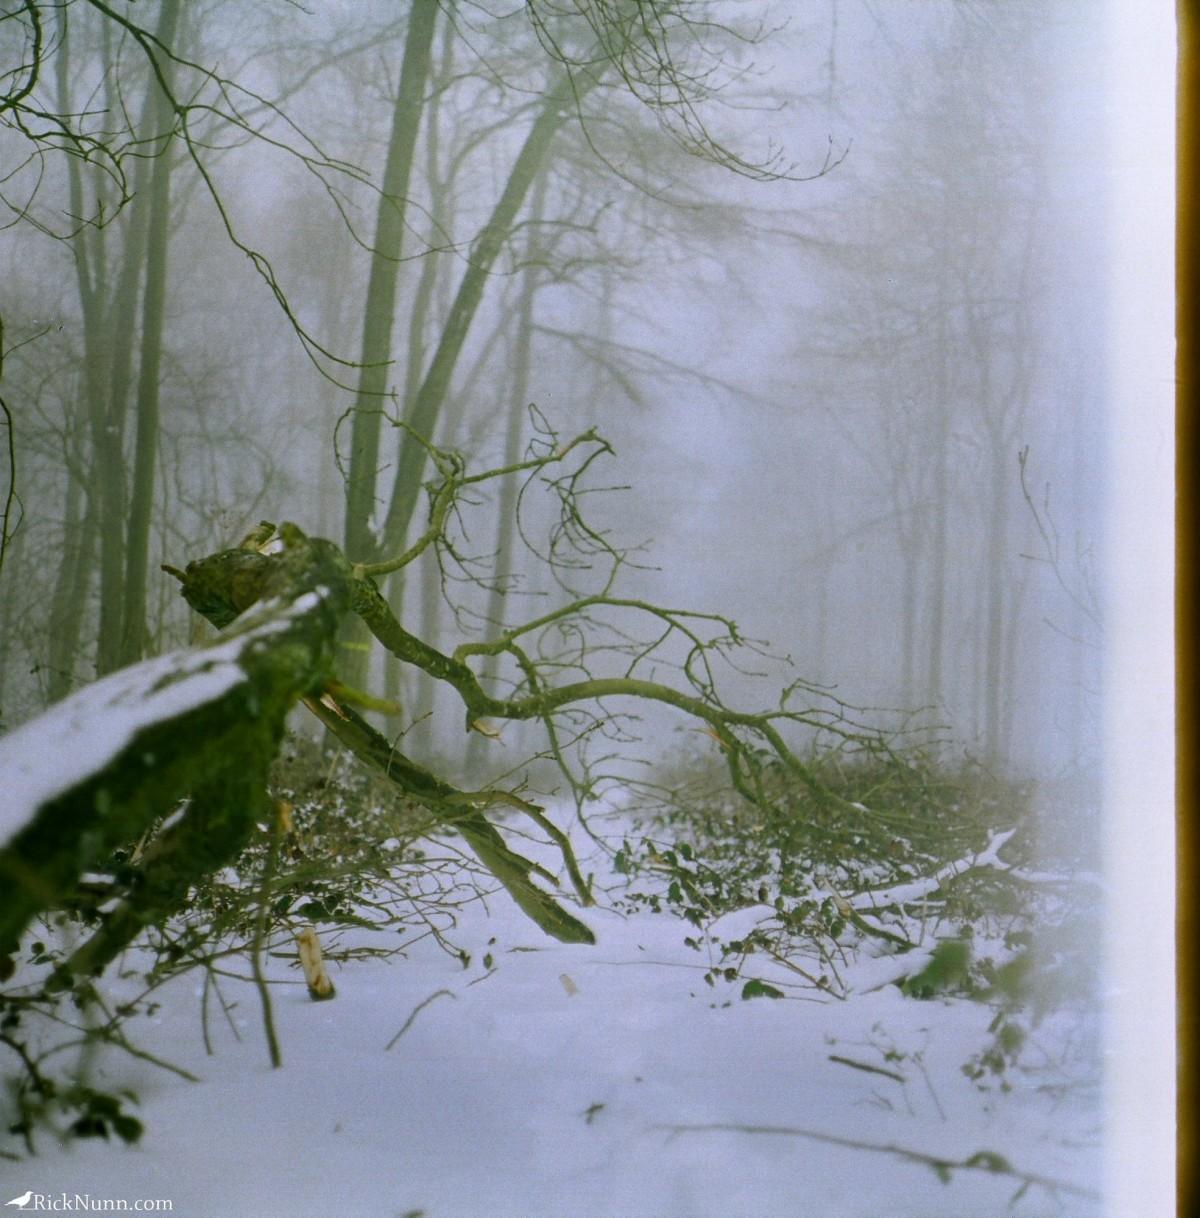 Kenwick Woods Cabin Weekend — Film Edition - IslBG Photographed by Rick Nunn